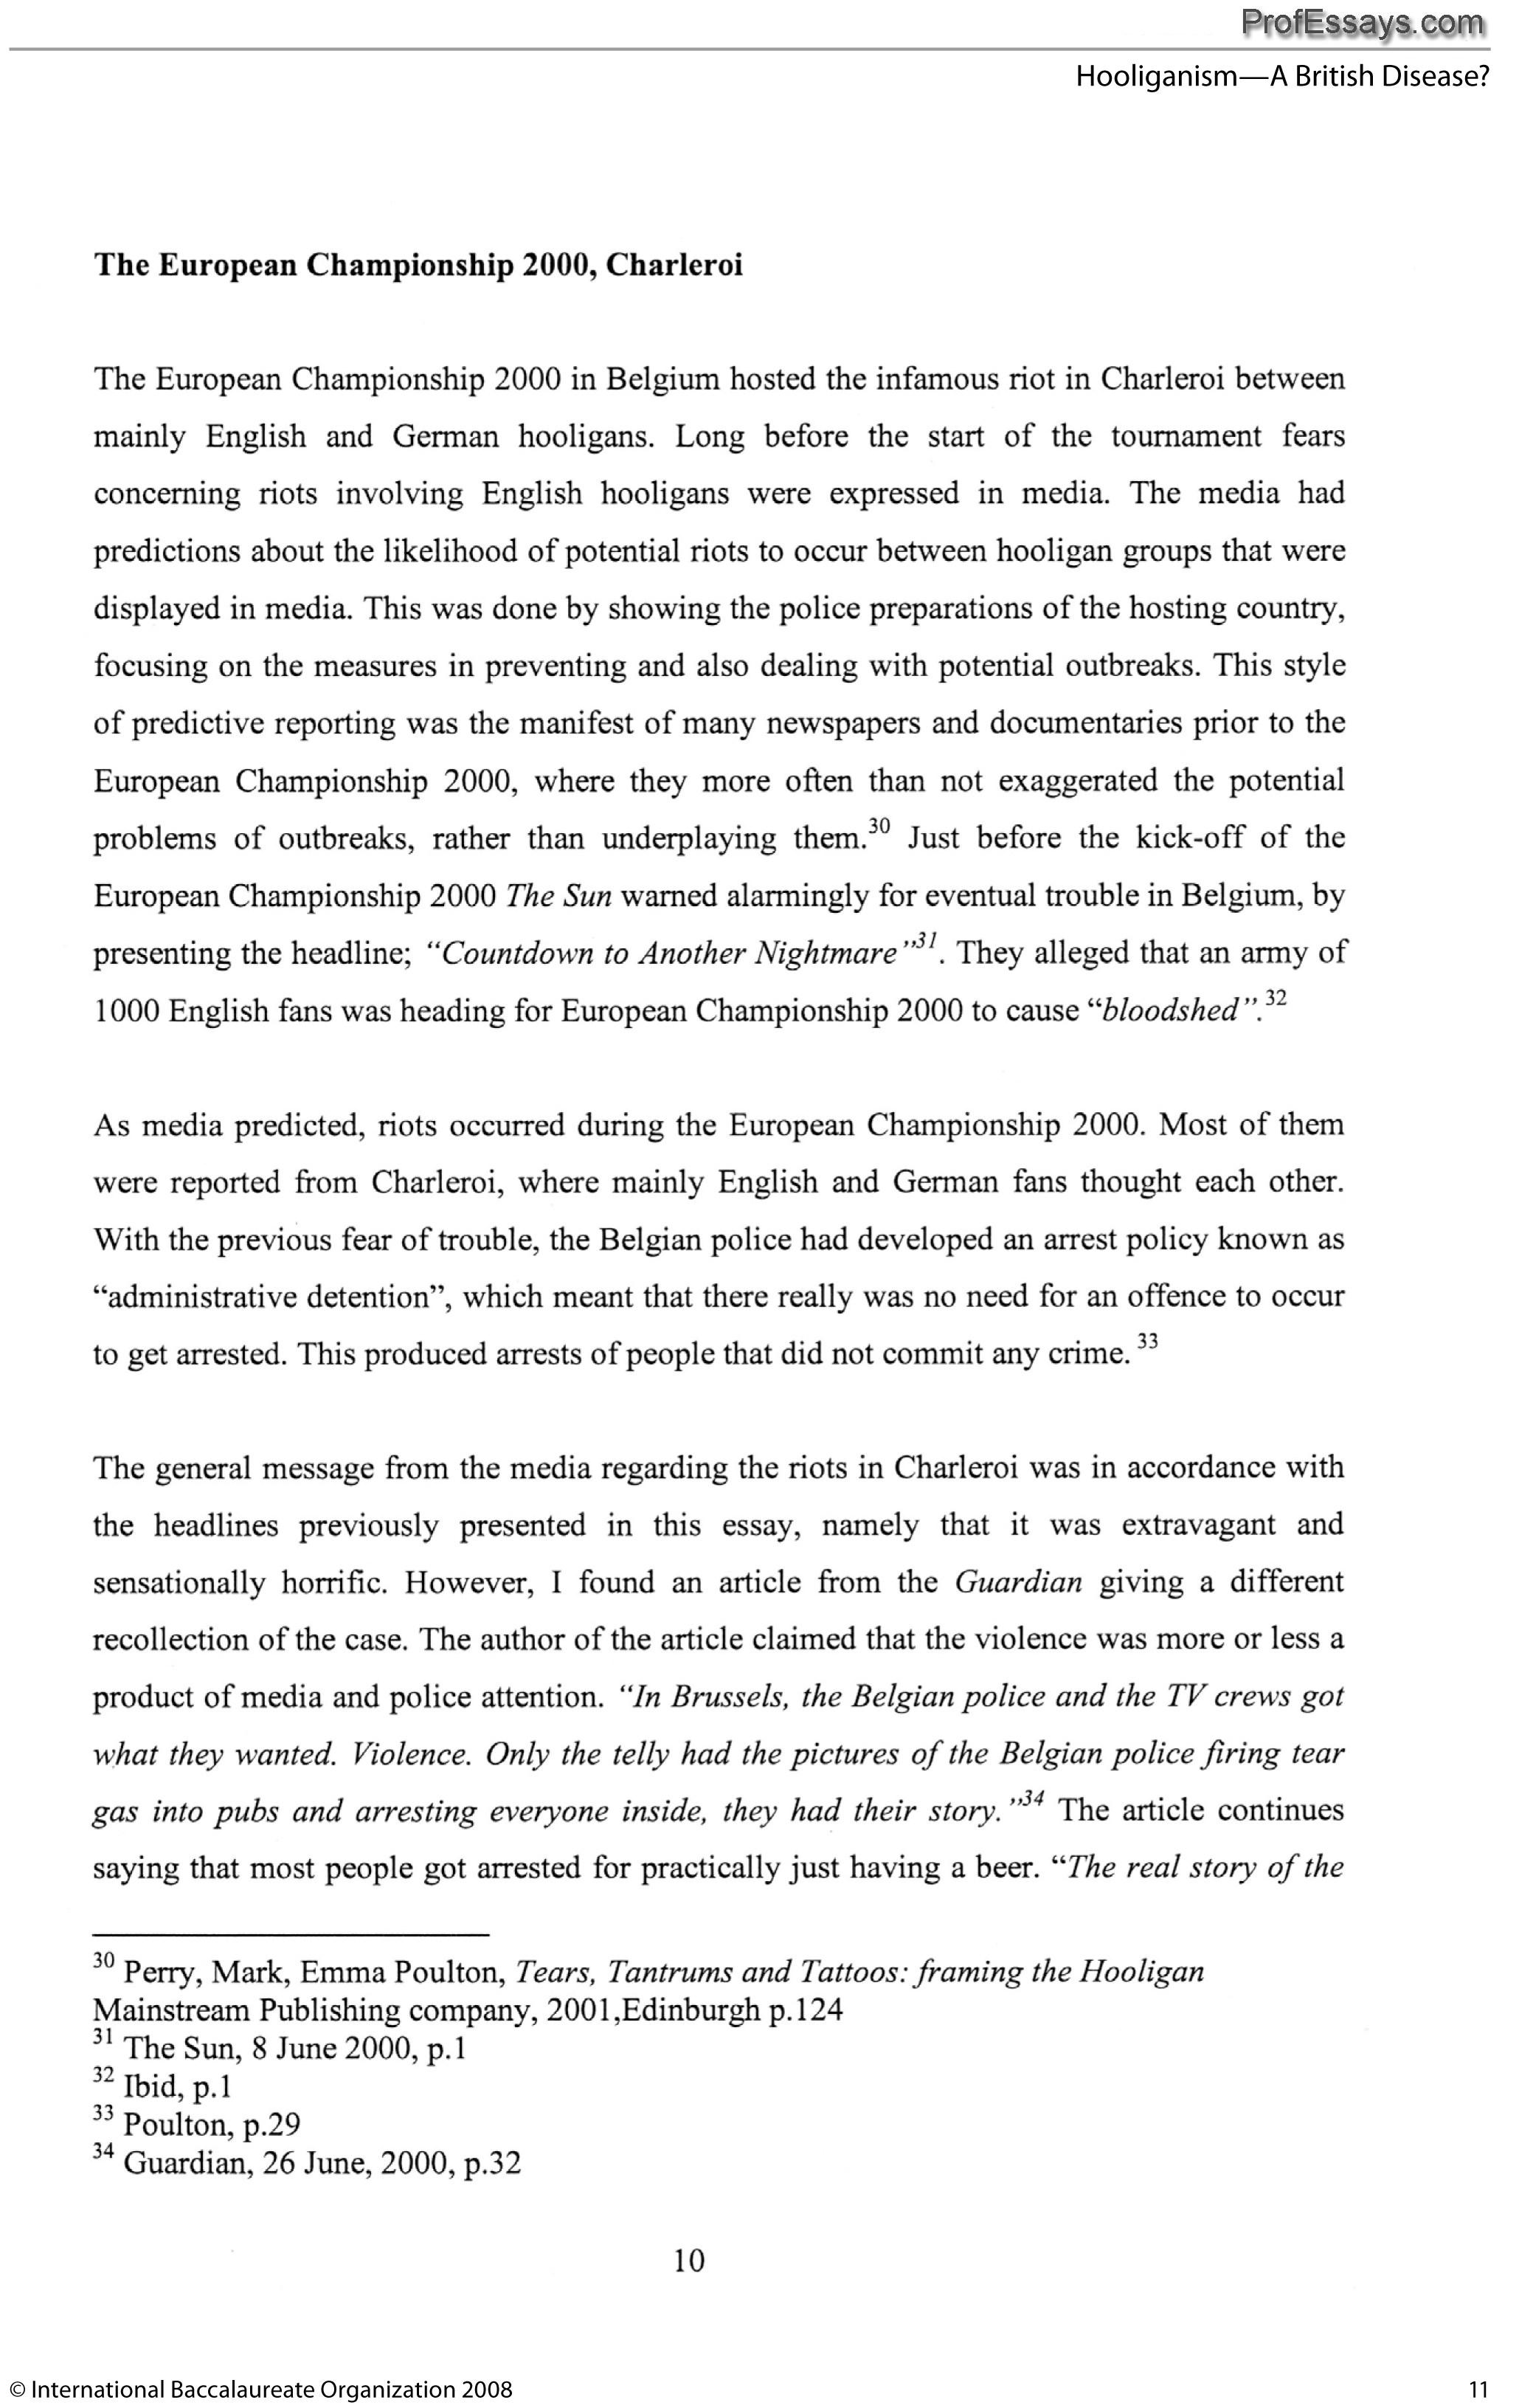 009 Ib Extended Essay Free Sample Example English Writing Striking Essays Creative Full